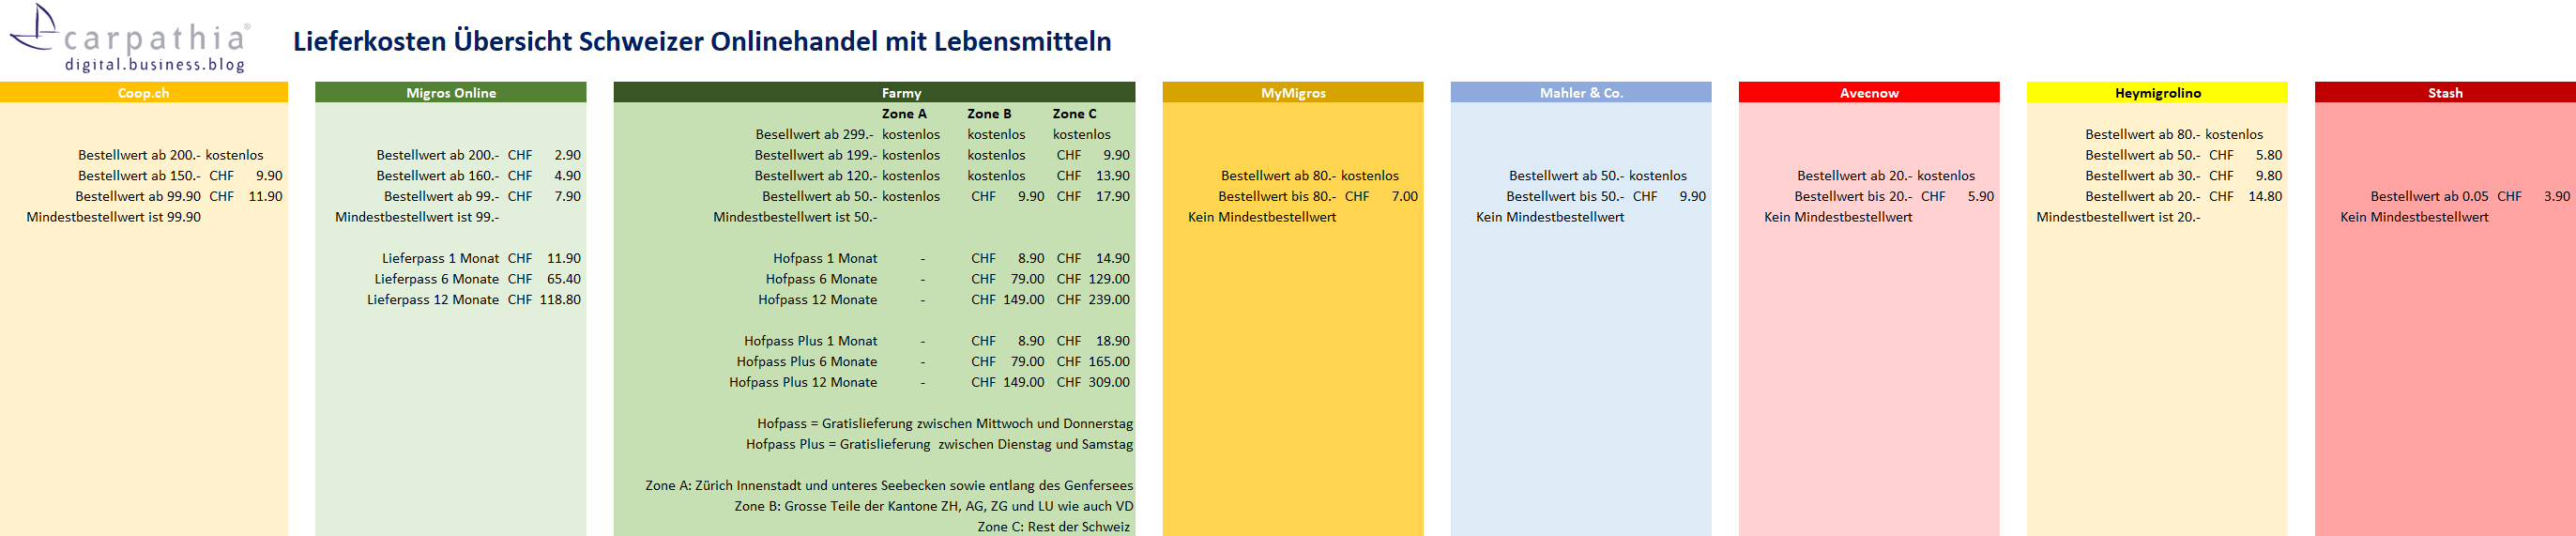 Lieferkosten Schweizer Onlinehandel mit Lebensmitteln - Grafik: Carpathia AG